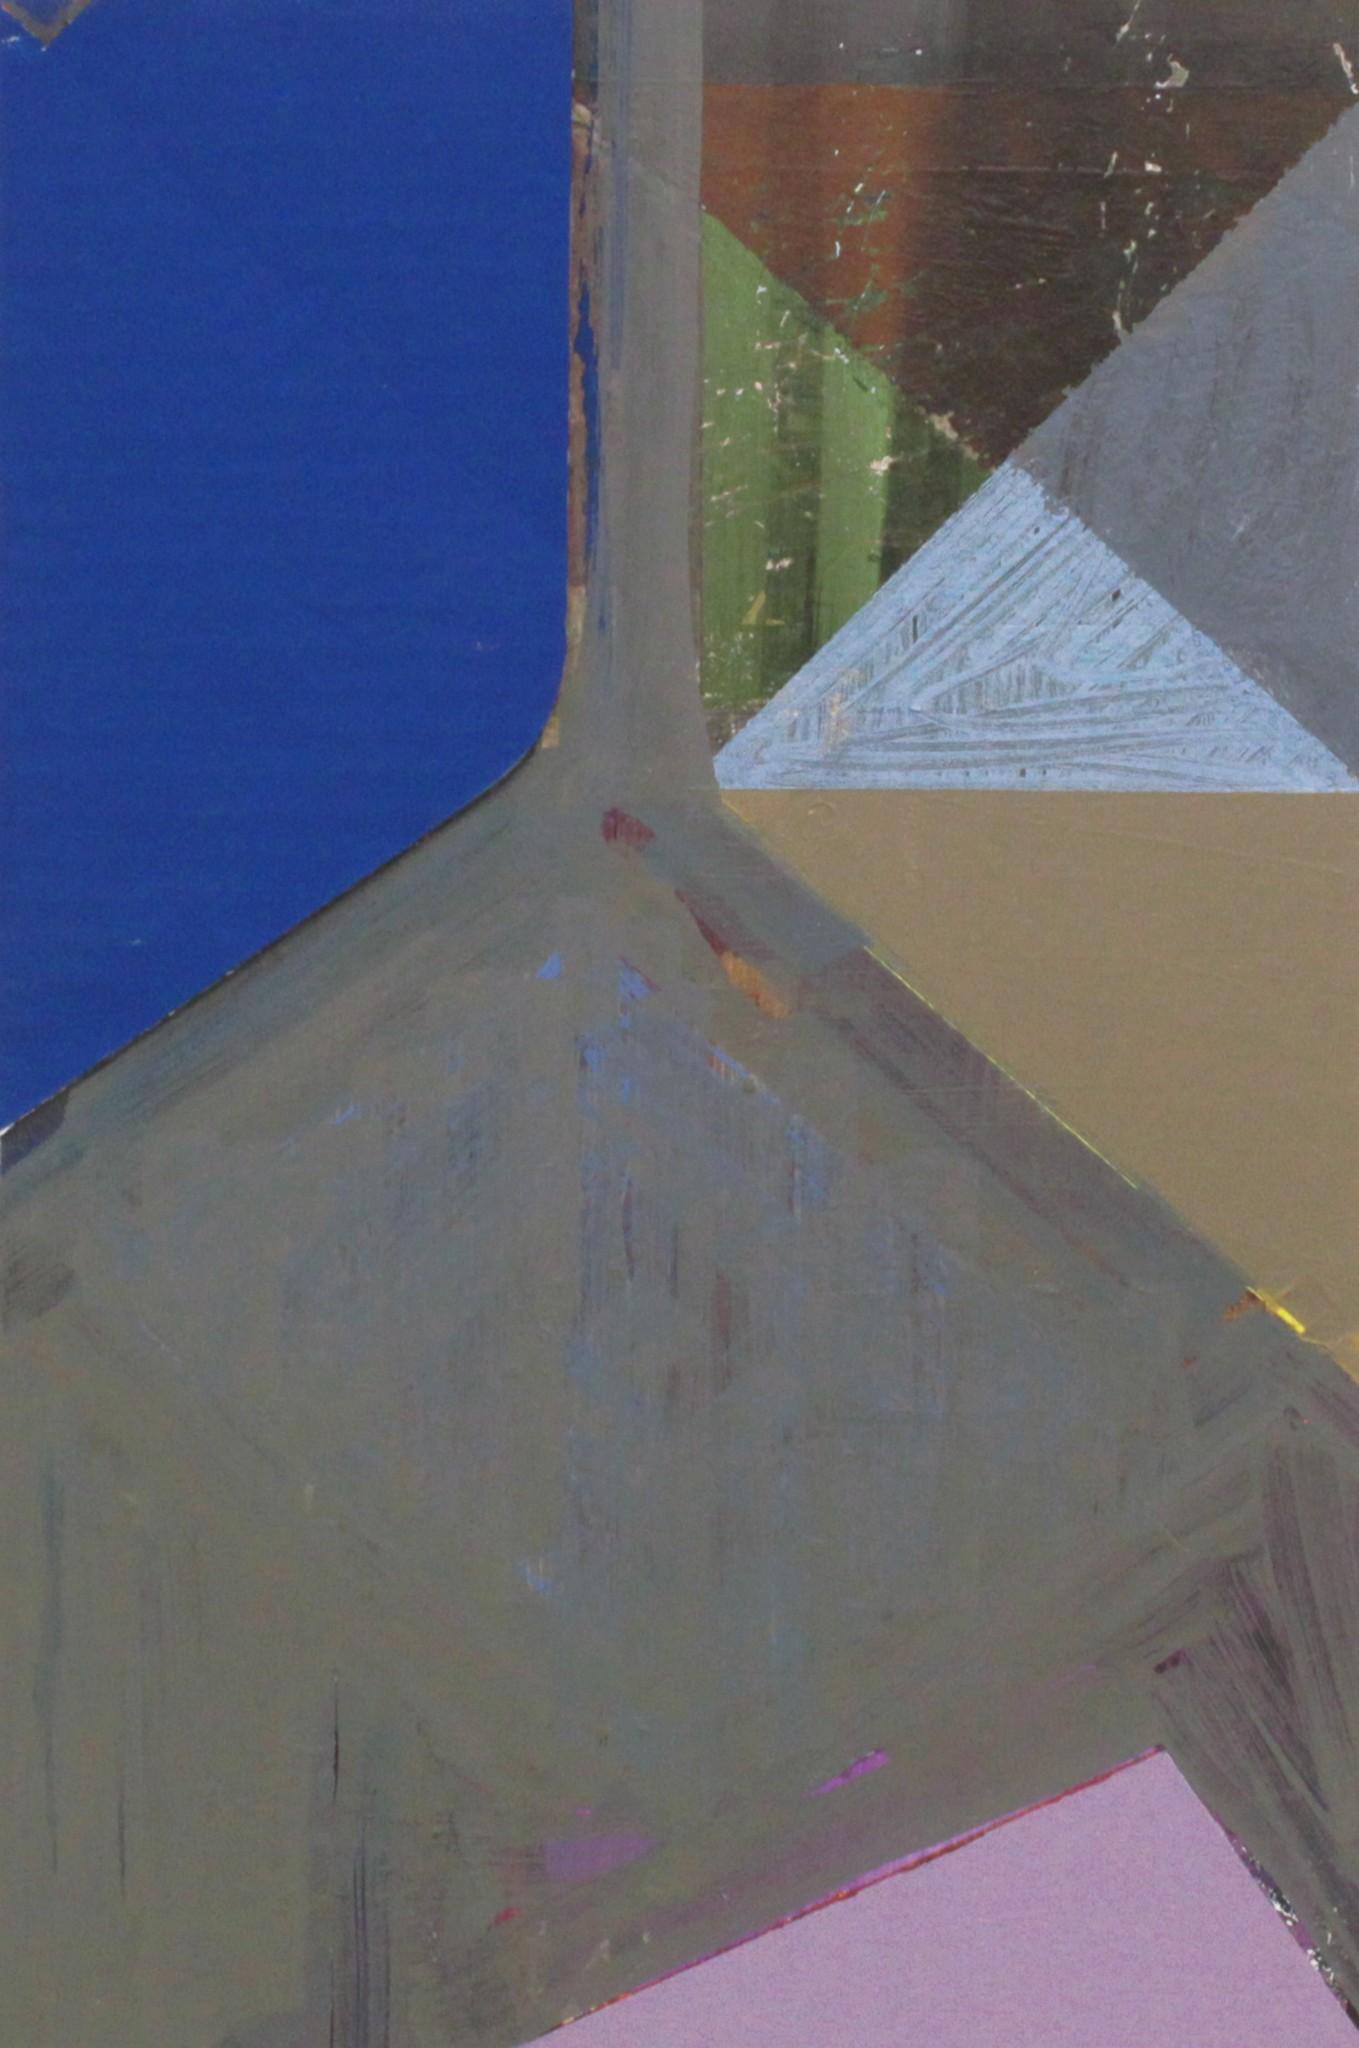 kollage, gouache på papper, 32 x 21 cm, 2019